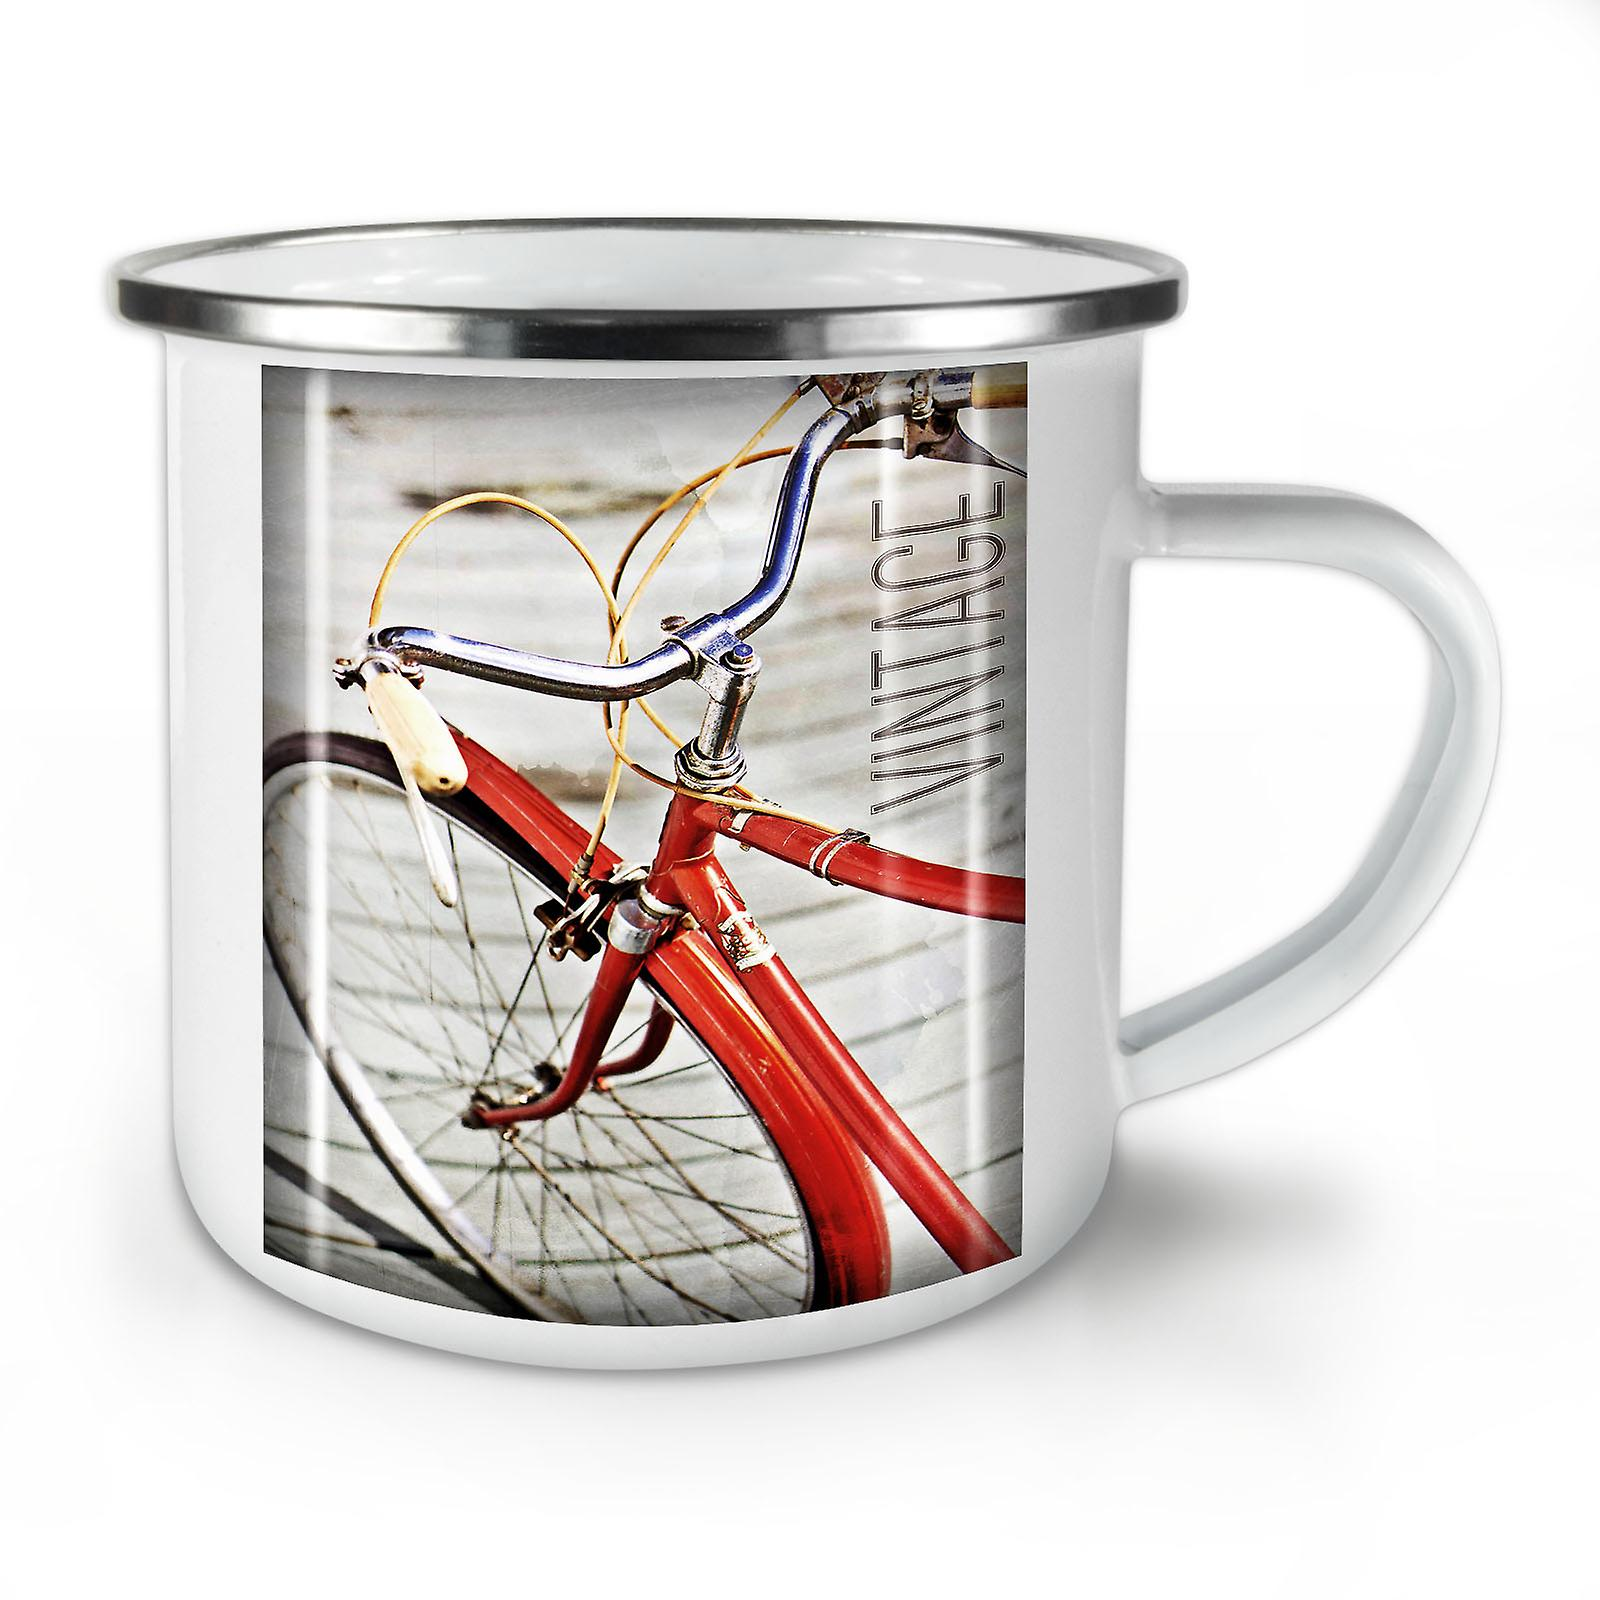 OzWellcoda Mug10 New Bike Hippie Enamel Whitetea Old Coffee LR34A5j